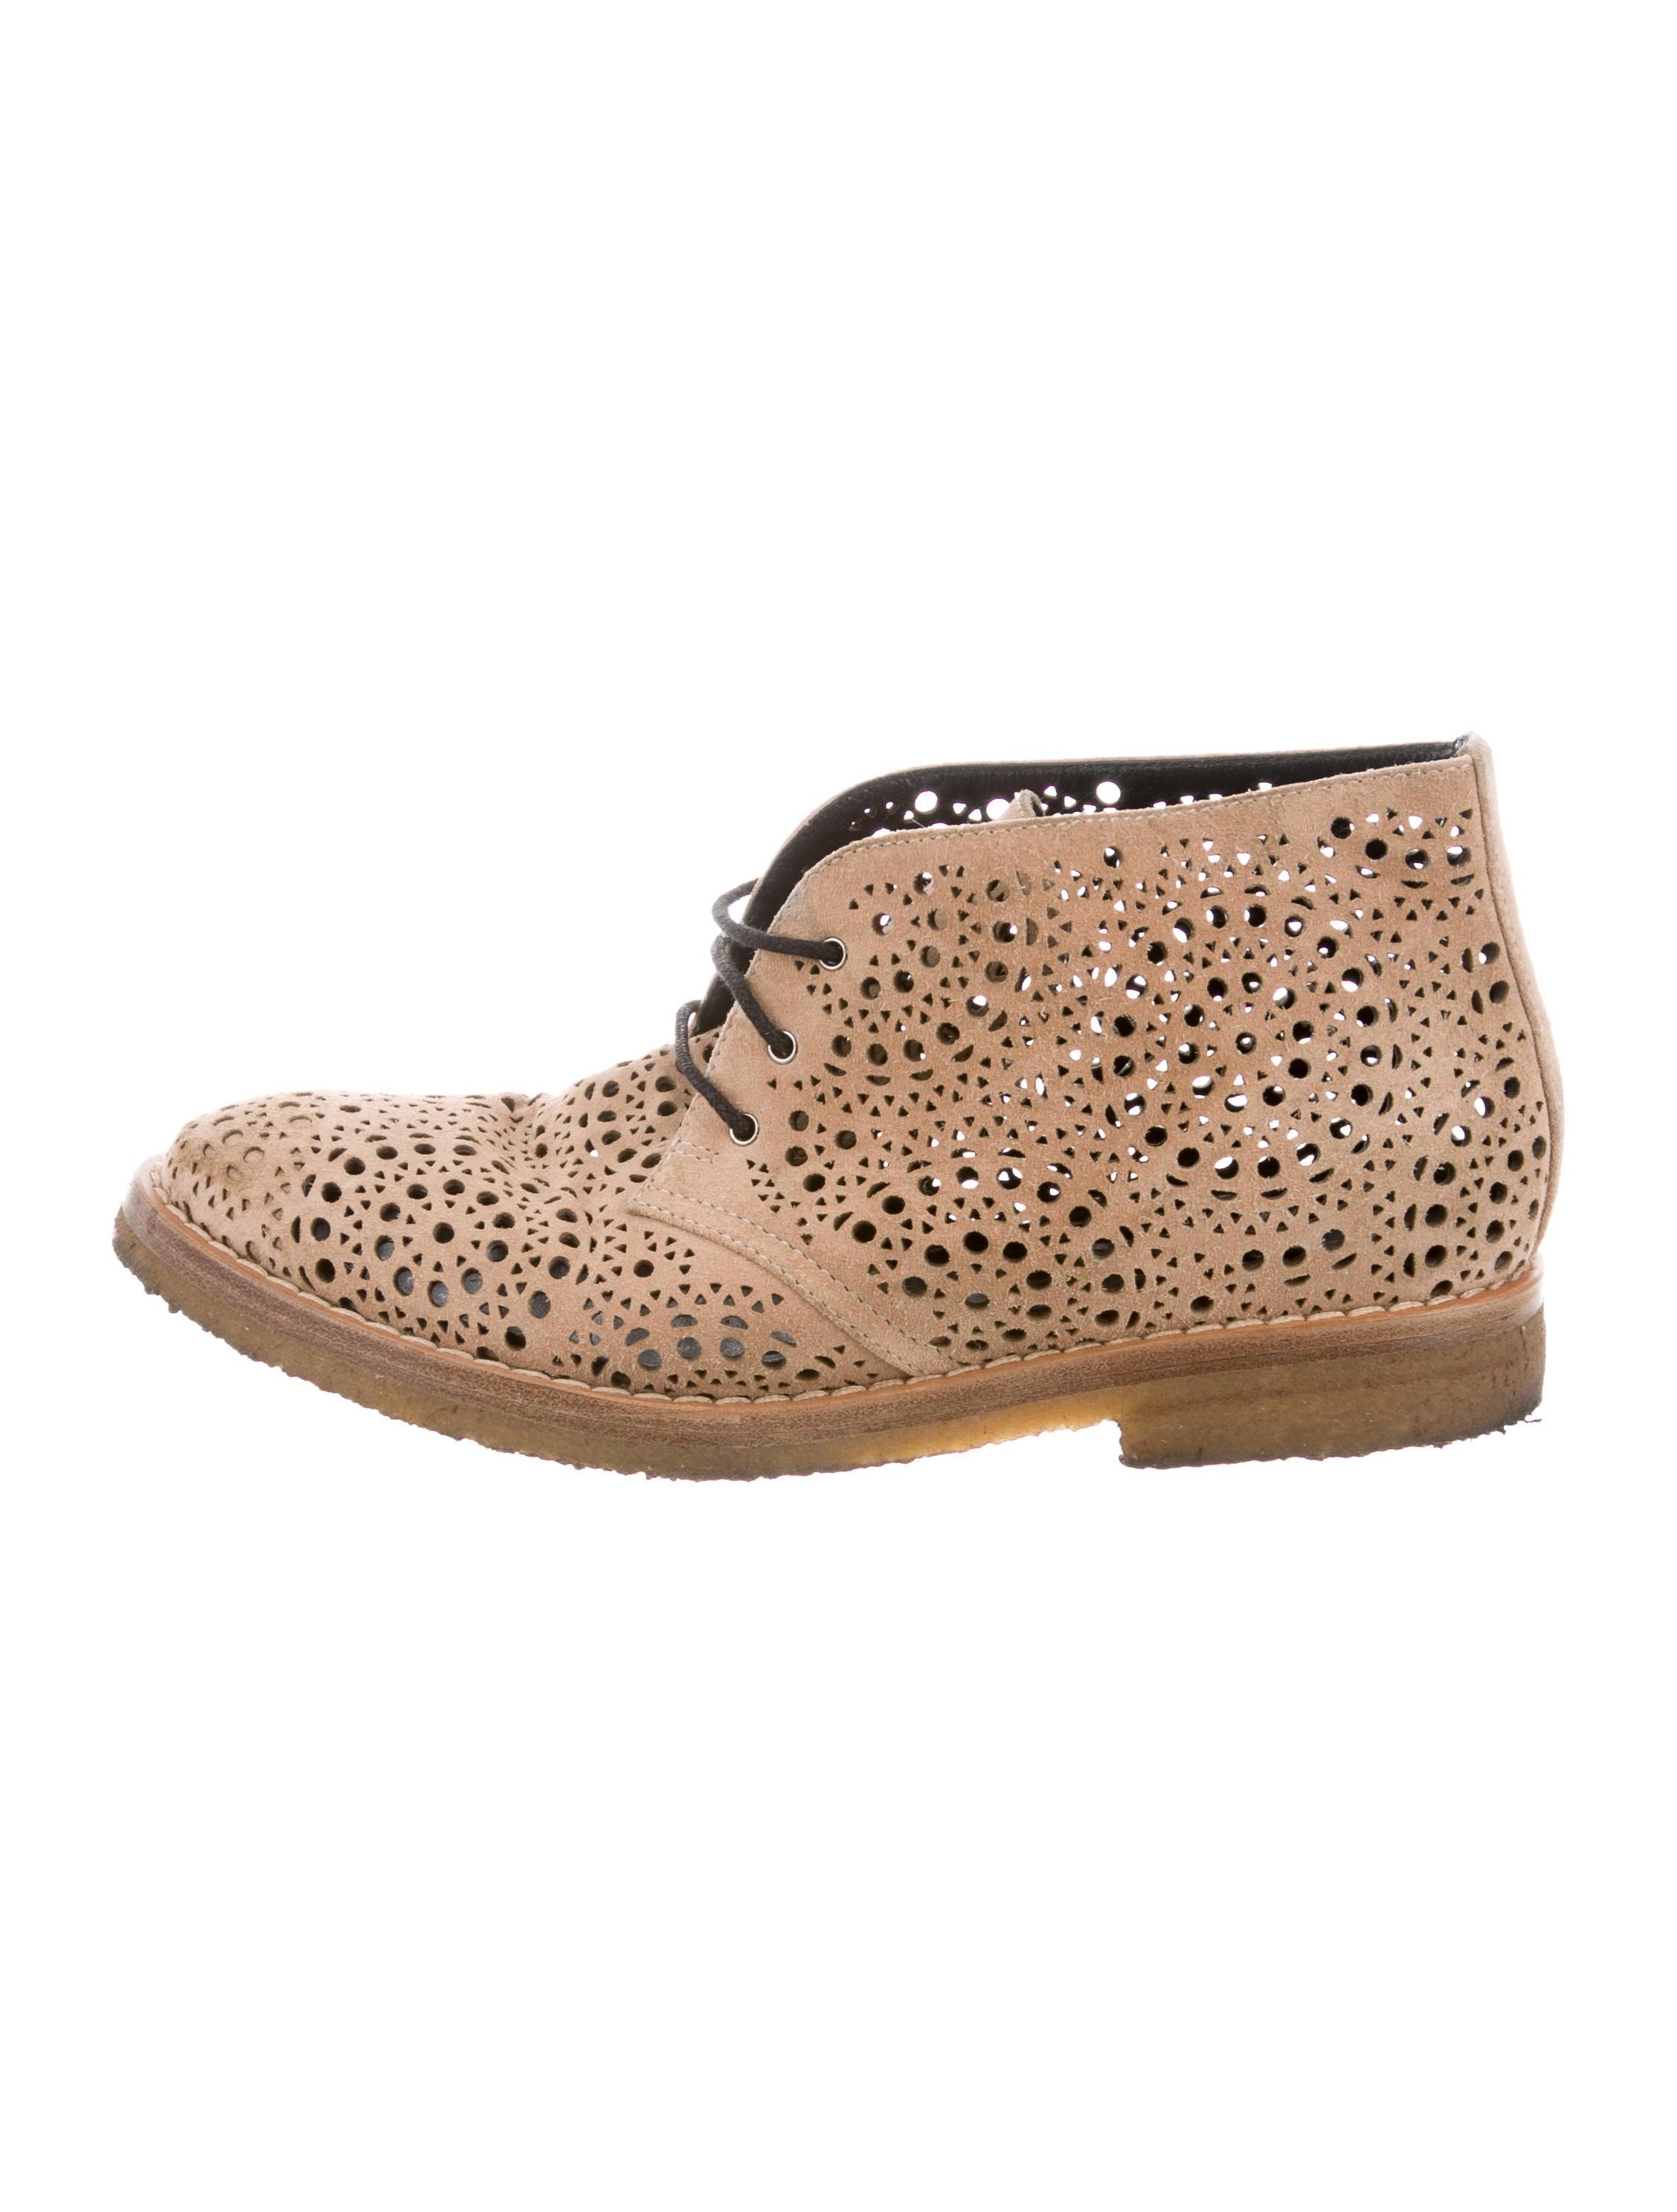 Alaïa Laser Cut Round-Toe Loafers buy cheap looking for bimMLMmR6W